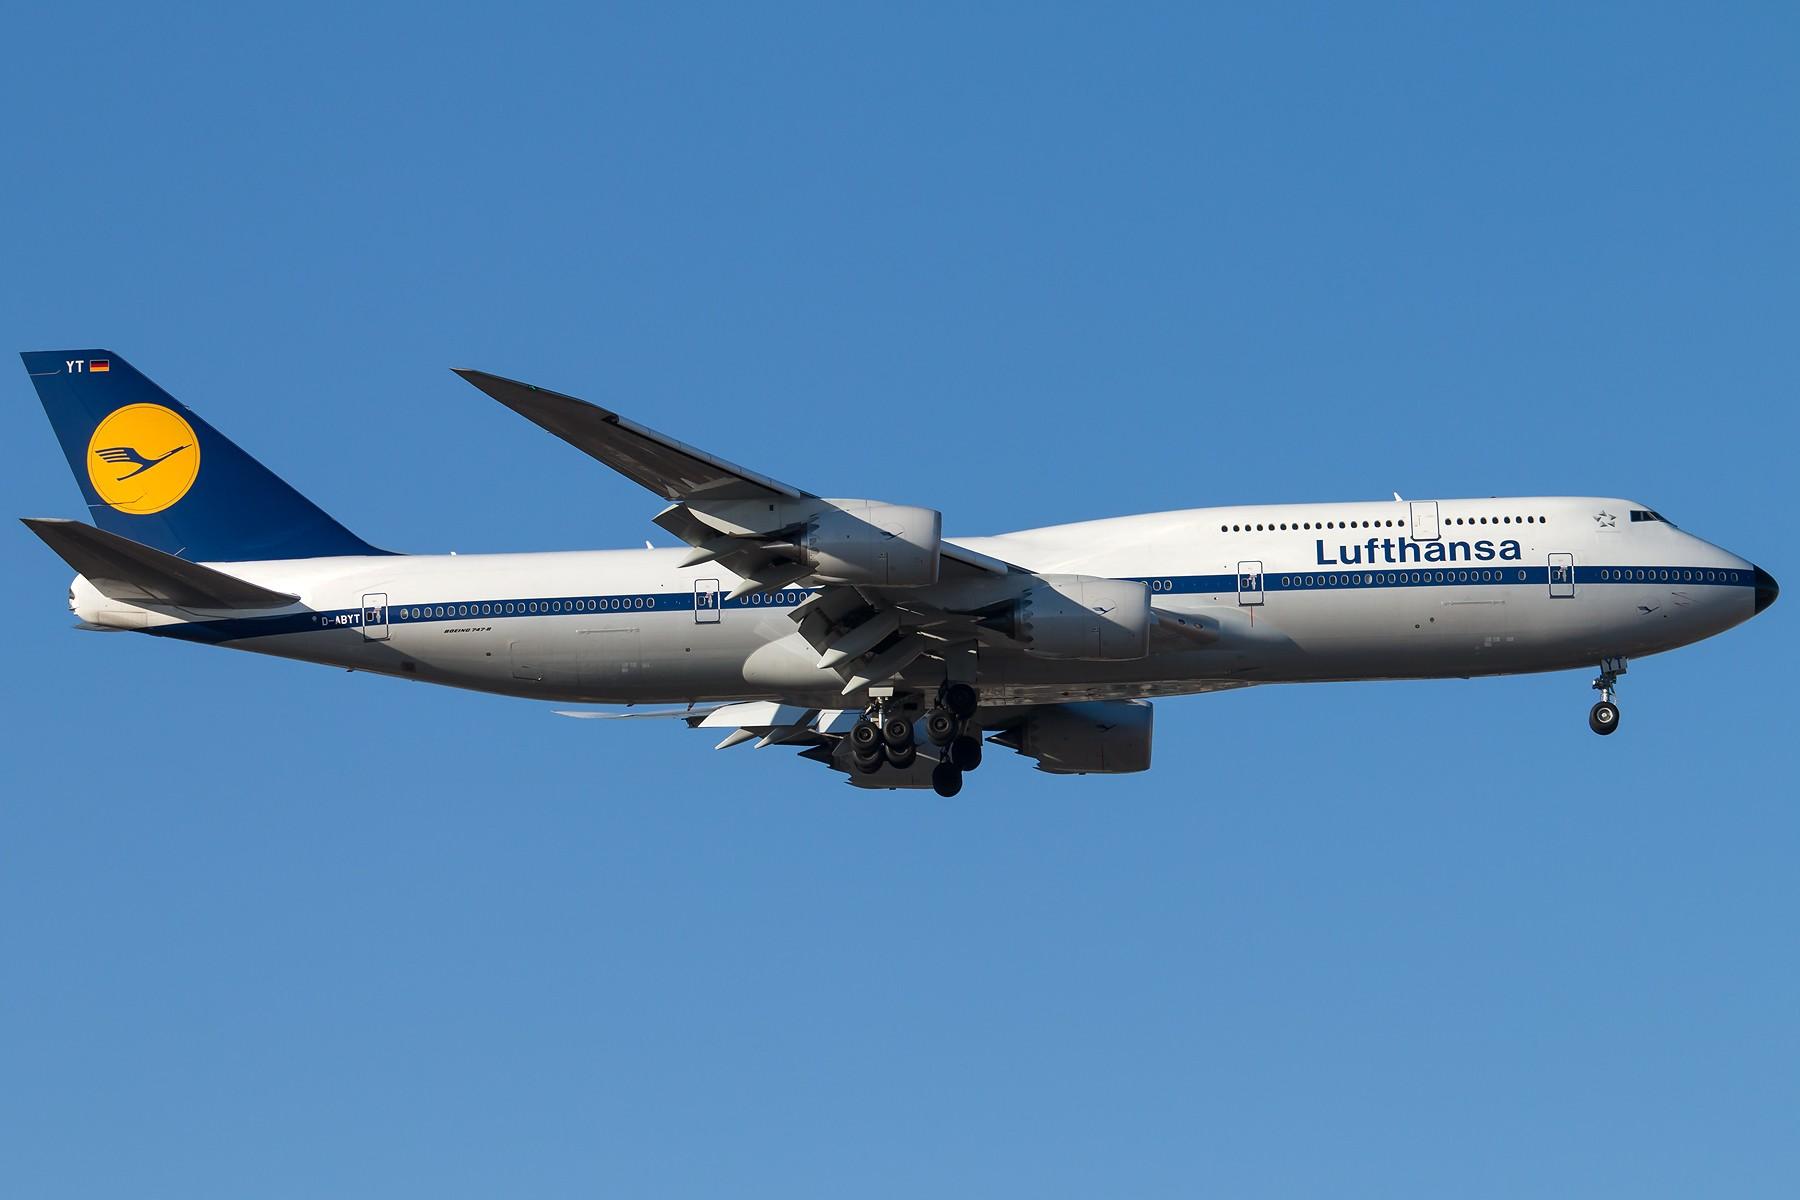 [原创][一图党]Lufthansa D-ABYT B747-8i Retro Livery 1800*1200 BOEING B747-8I D-ABYT 中国北京首都国际机场